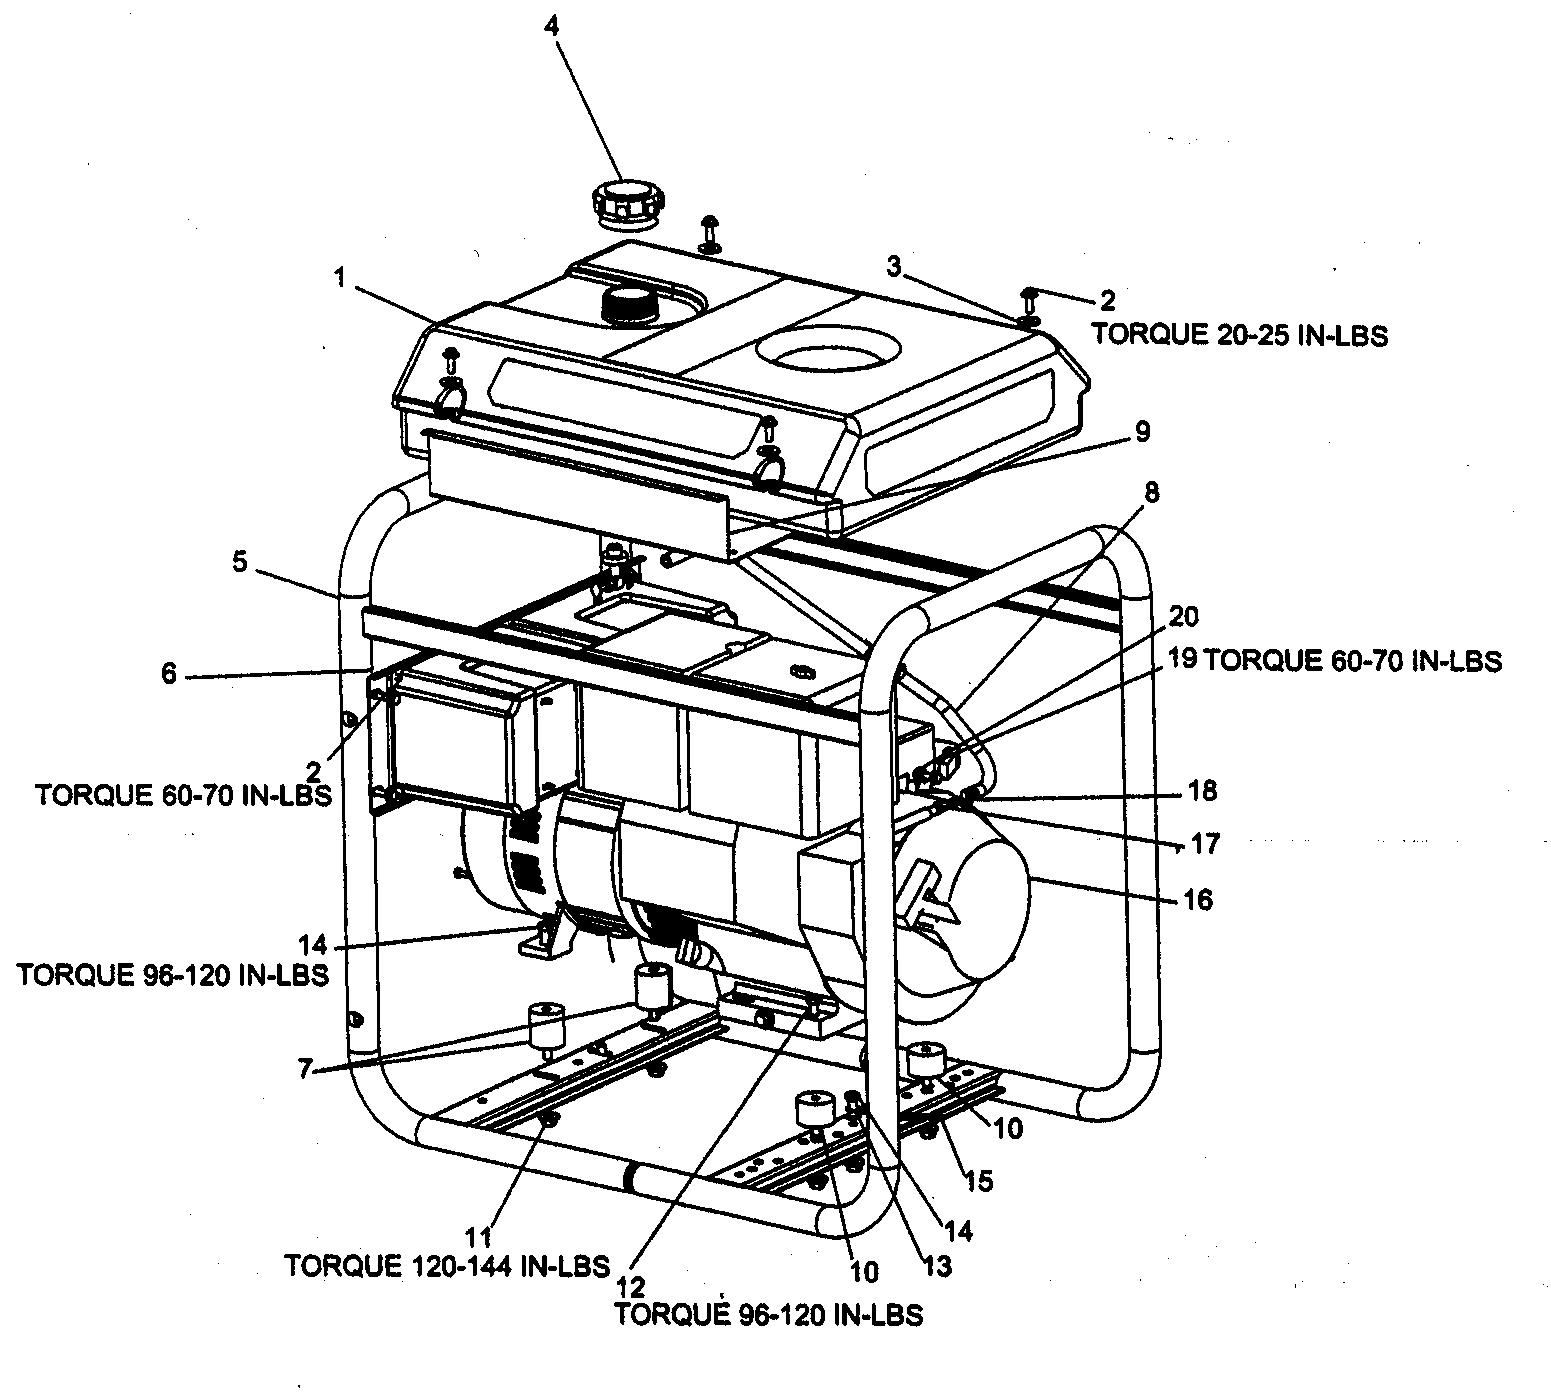 wiring diagram kohler generator 22kw remote spotlight wiring kohler engines troubleshooting kohler 17 hp wiring diagram free download